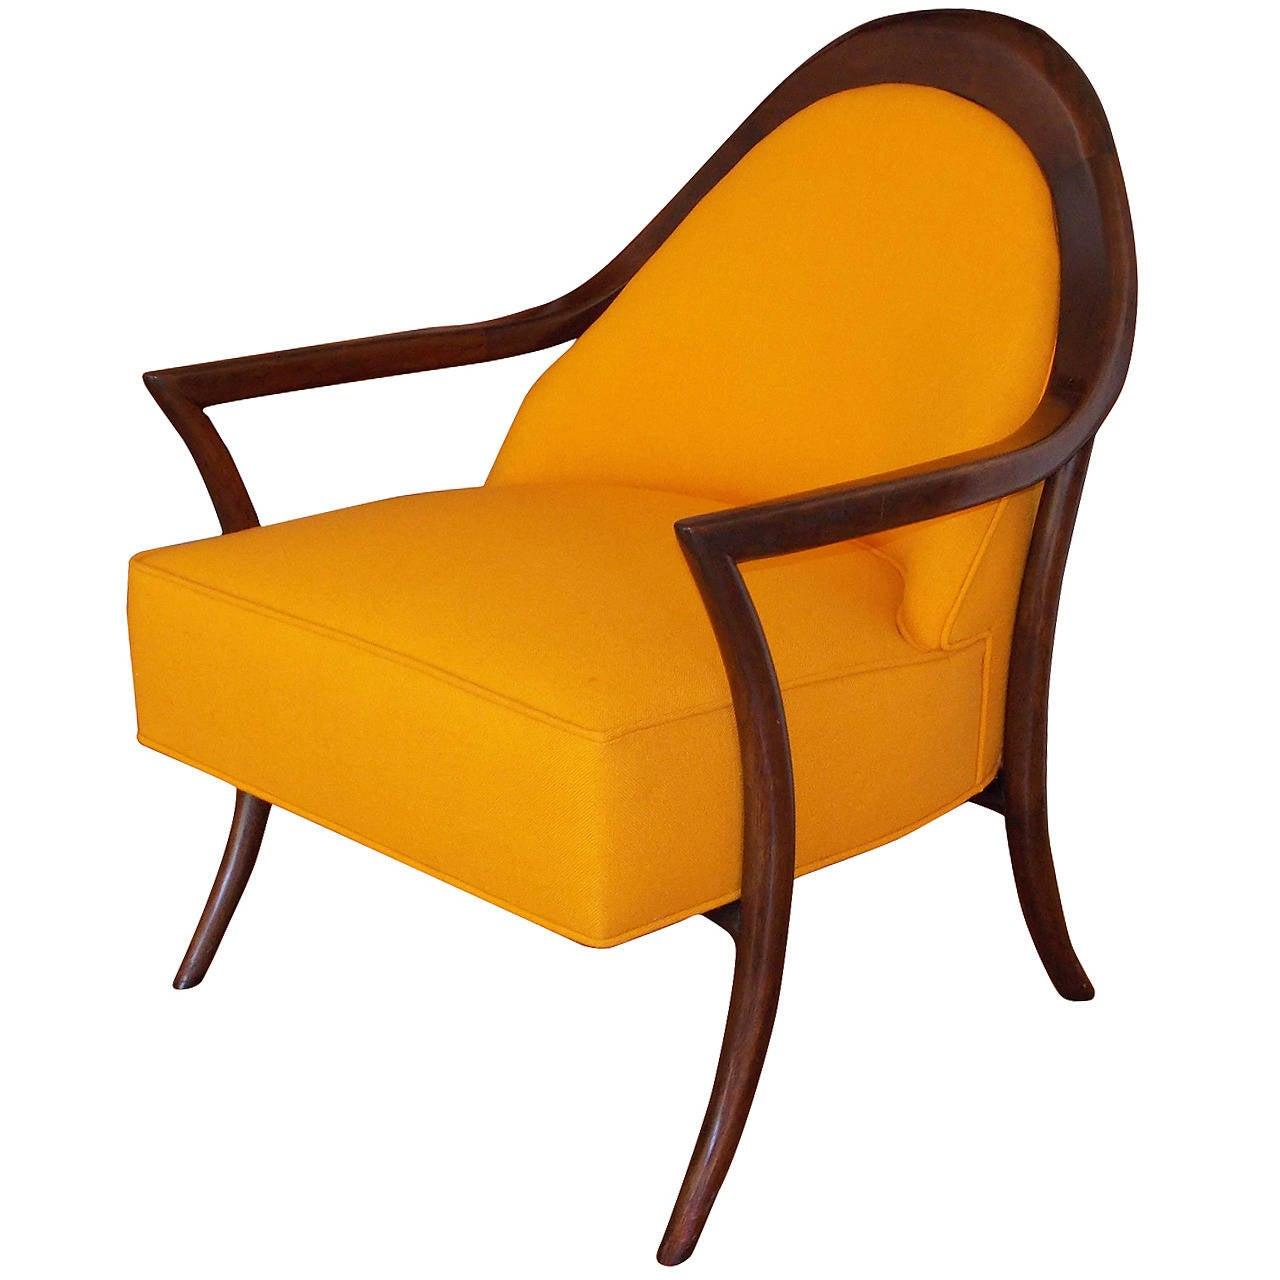 T h robsjohn gibbings lounge or anywhere chair at 1stdibs for Anywhere chair